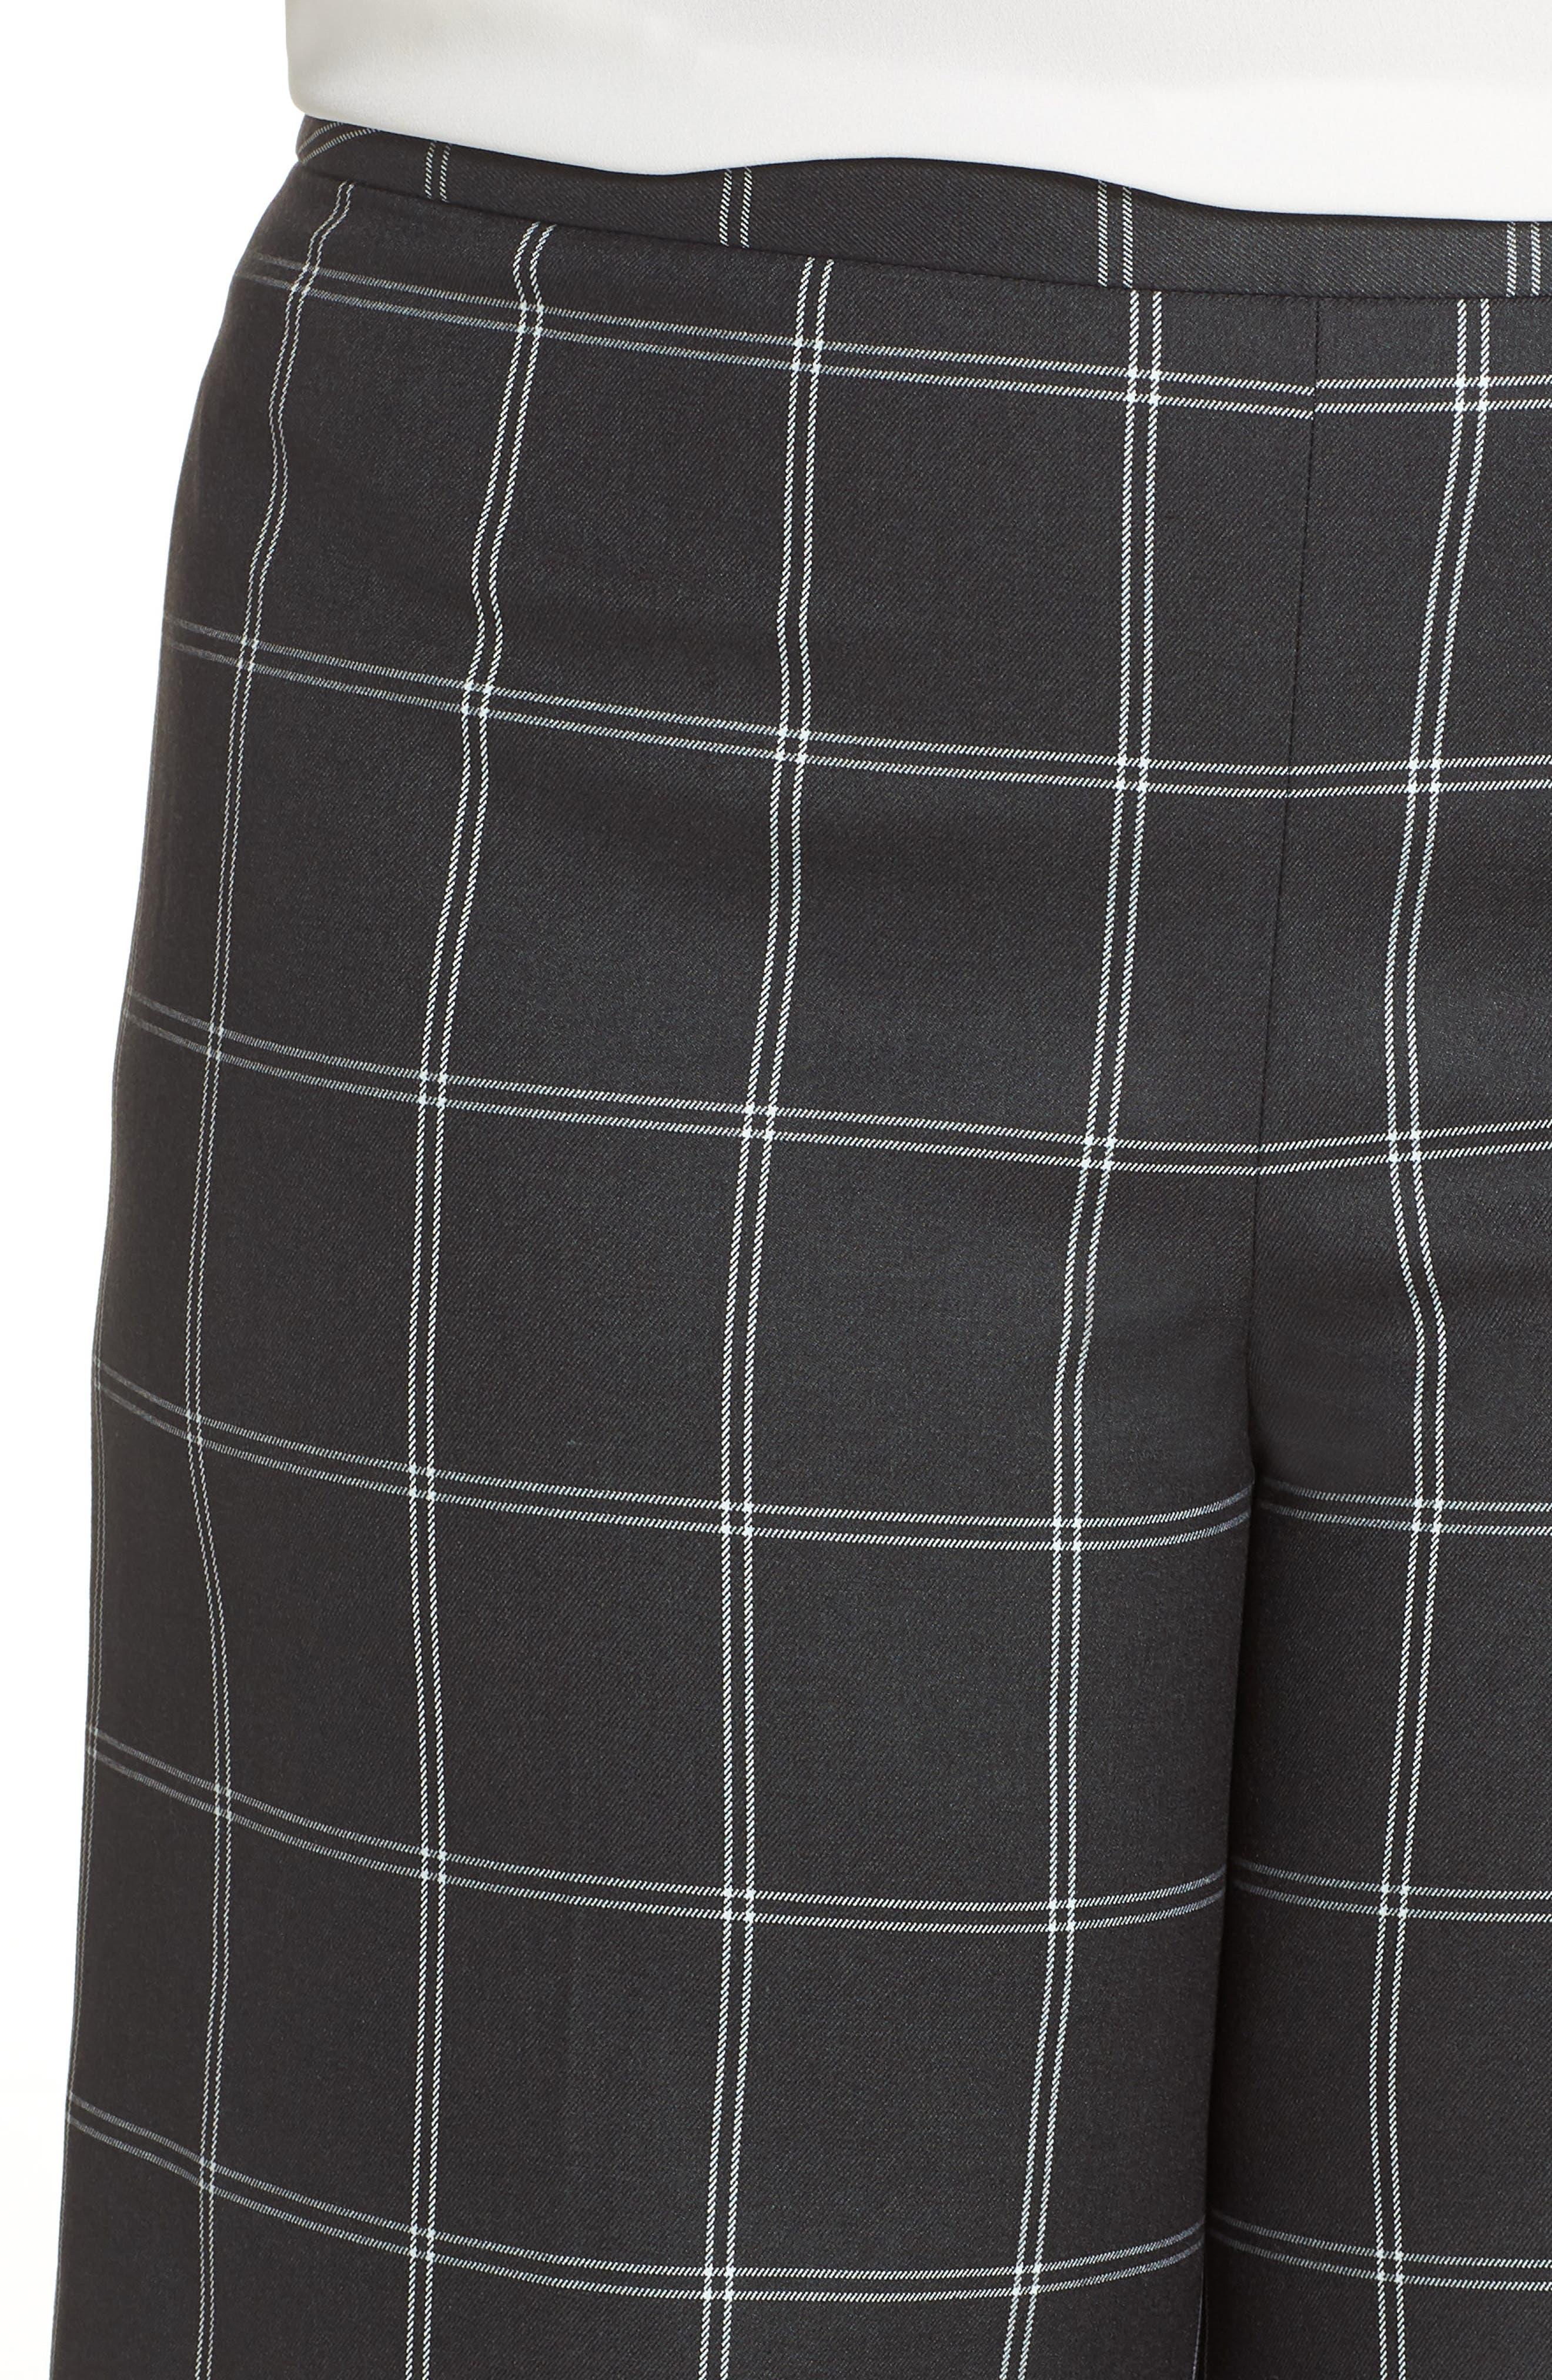 Windowpane Check Wide Leg Crop Pants,                             Alternate thumbnail 4, color,                             GREY TWILL PLAID